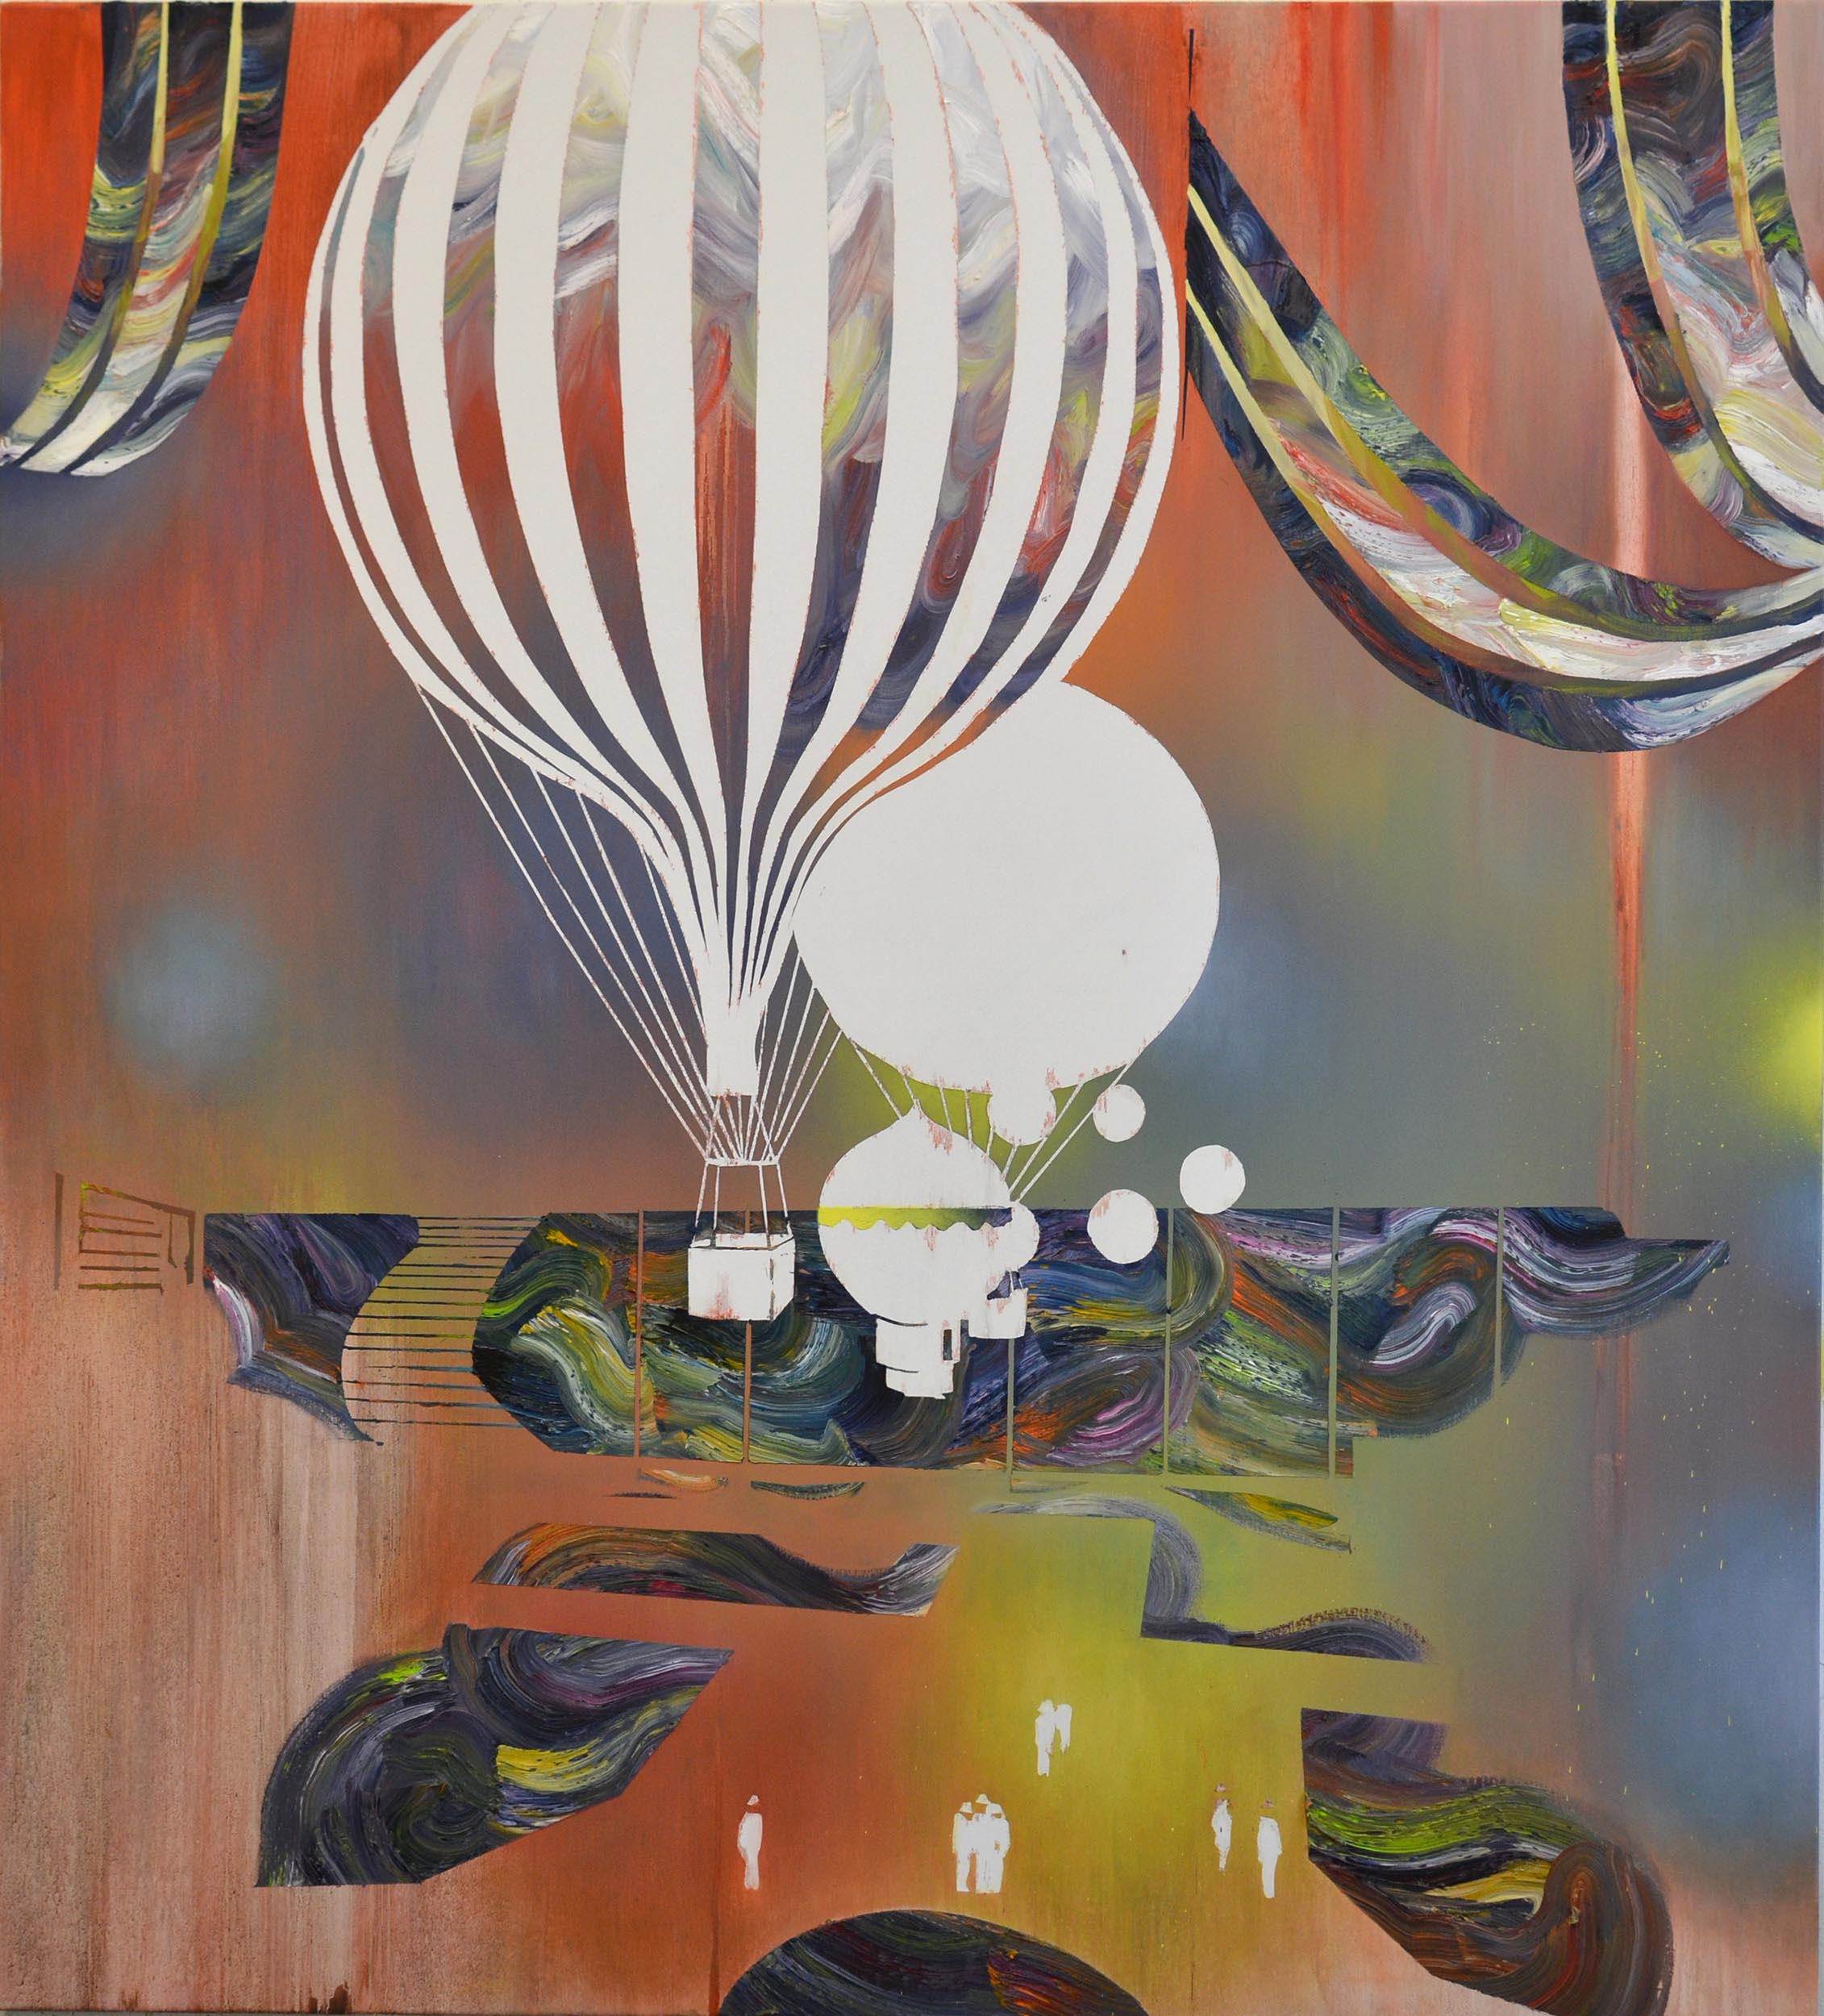 Ballon  oil on canvas 160 x 140 cm, 2013